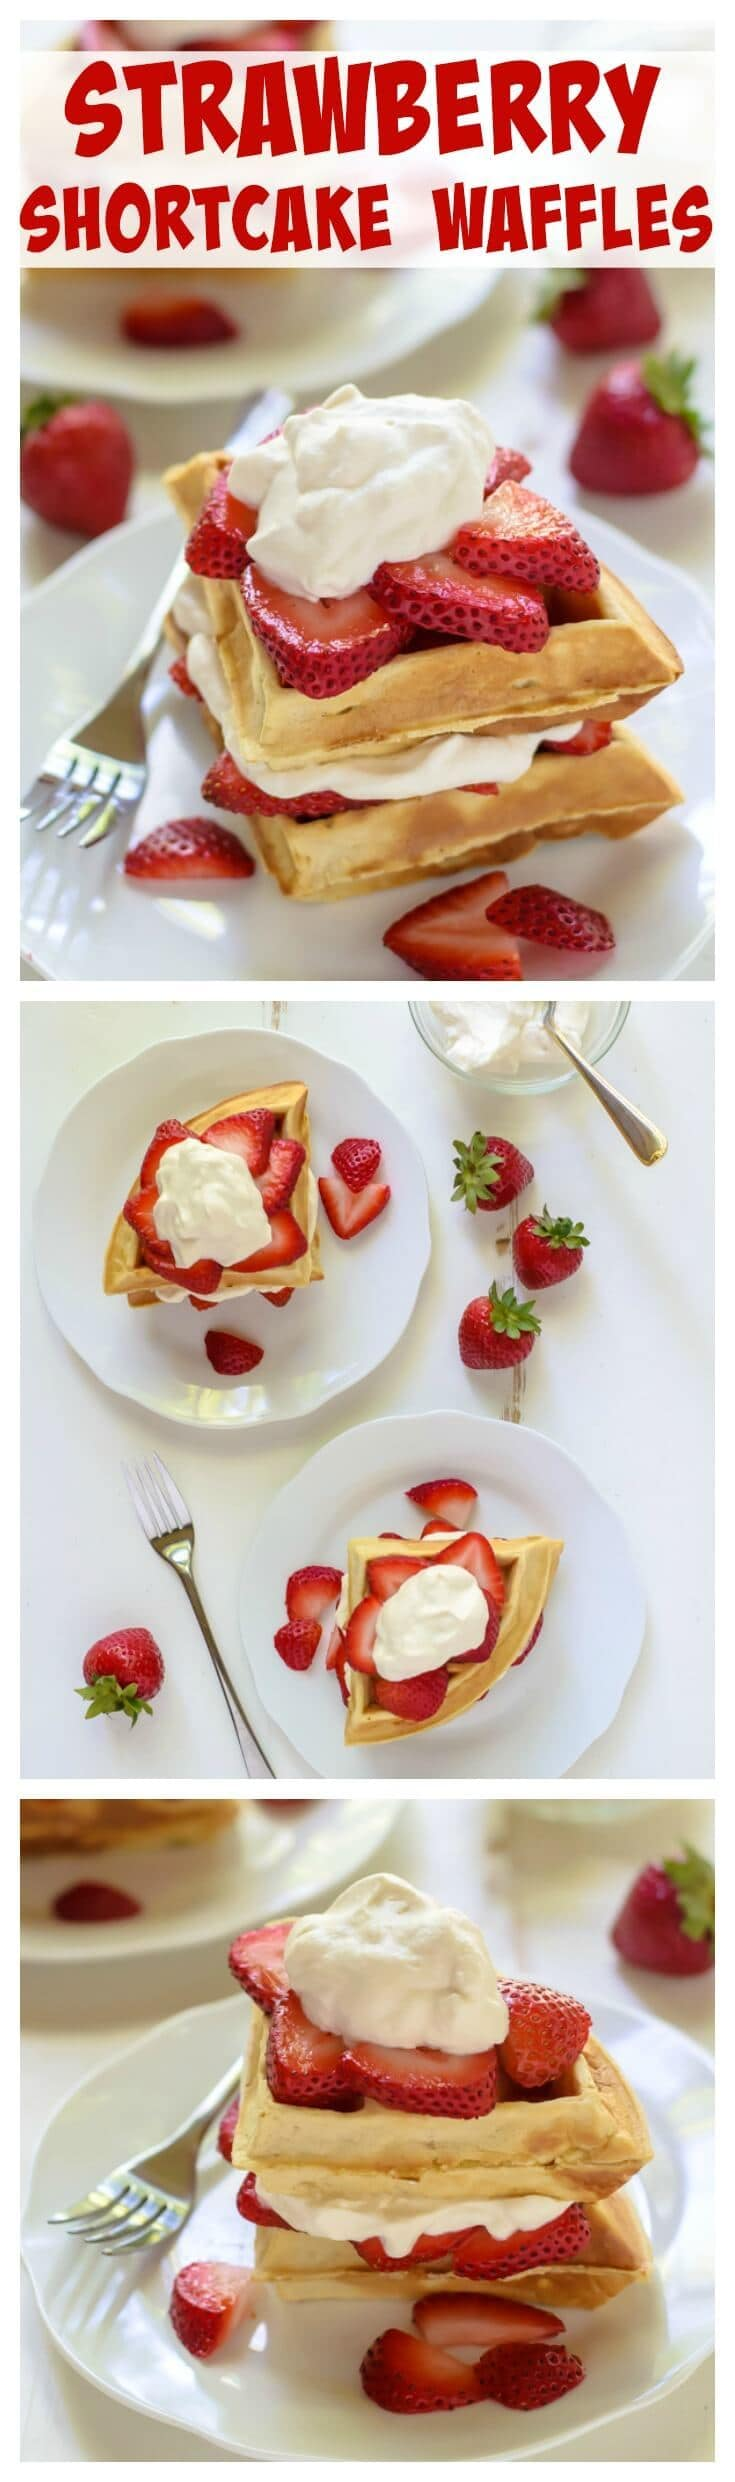 Strawberry Shortcake Waffles with Maple Whipped Cream